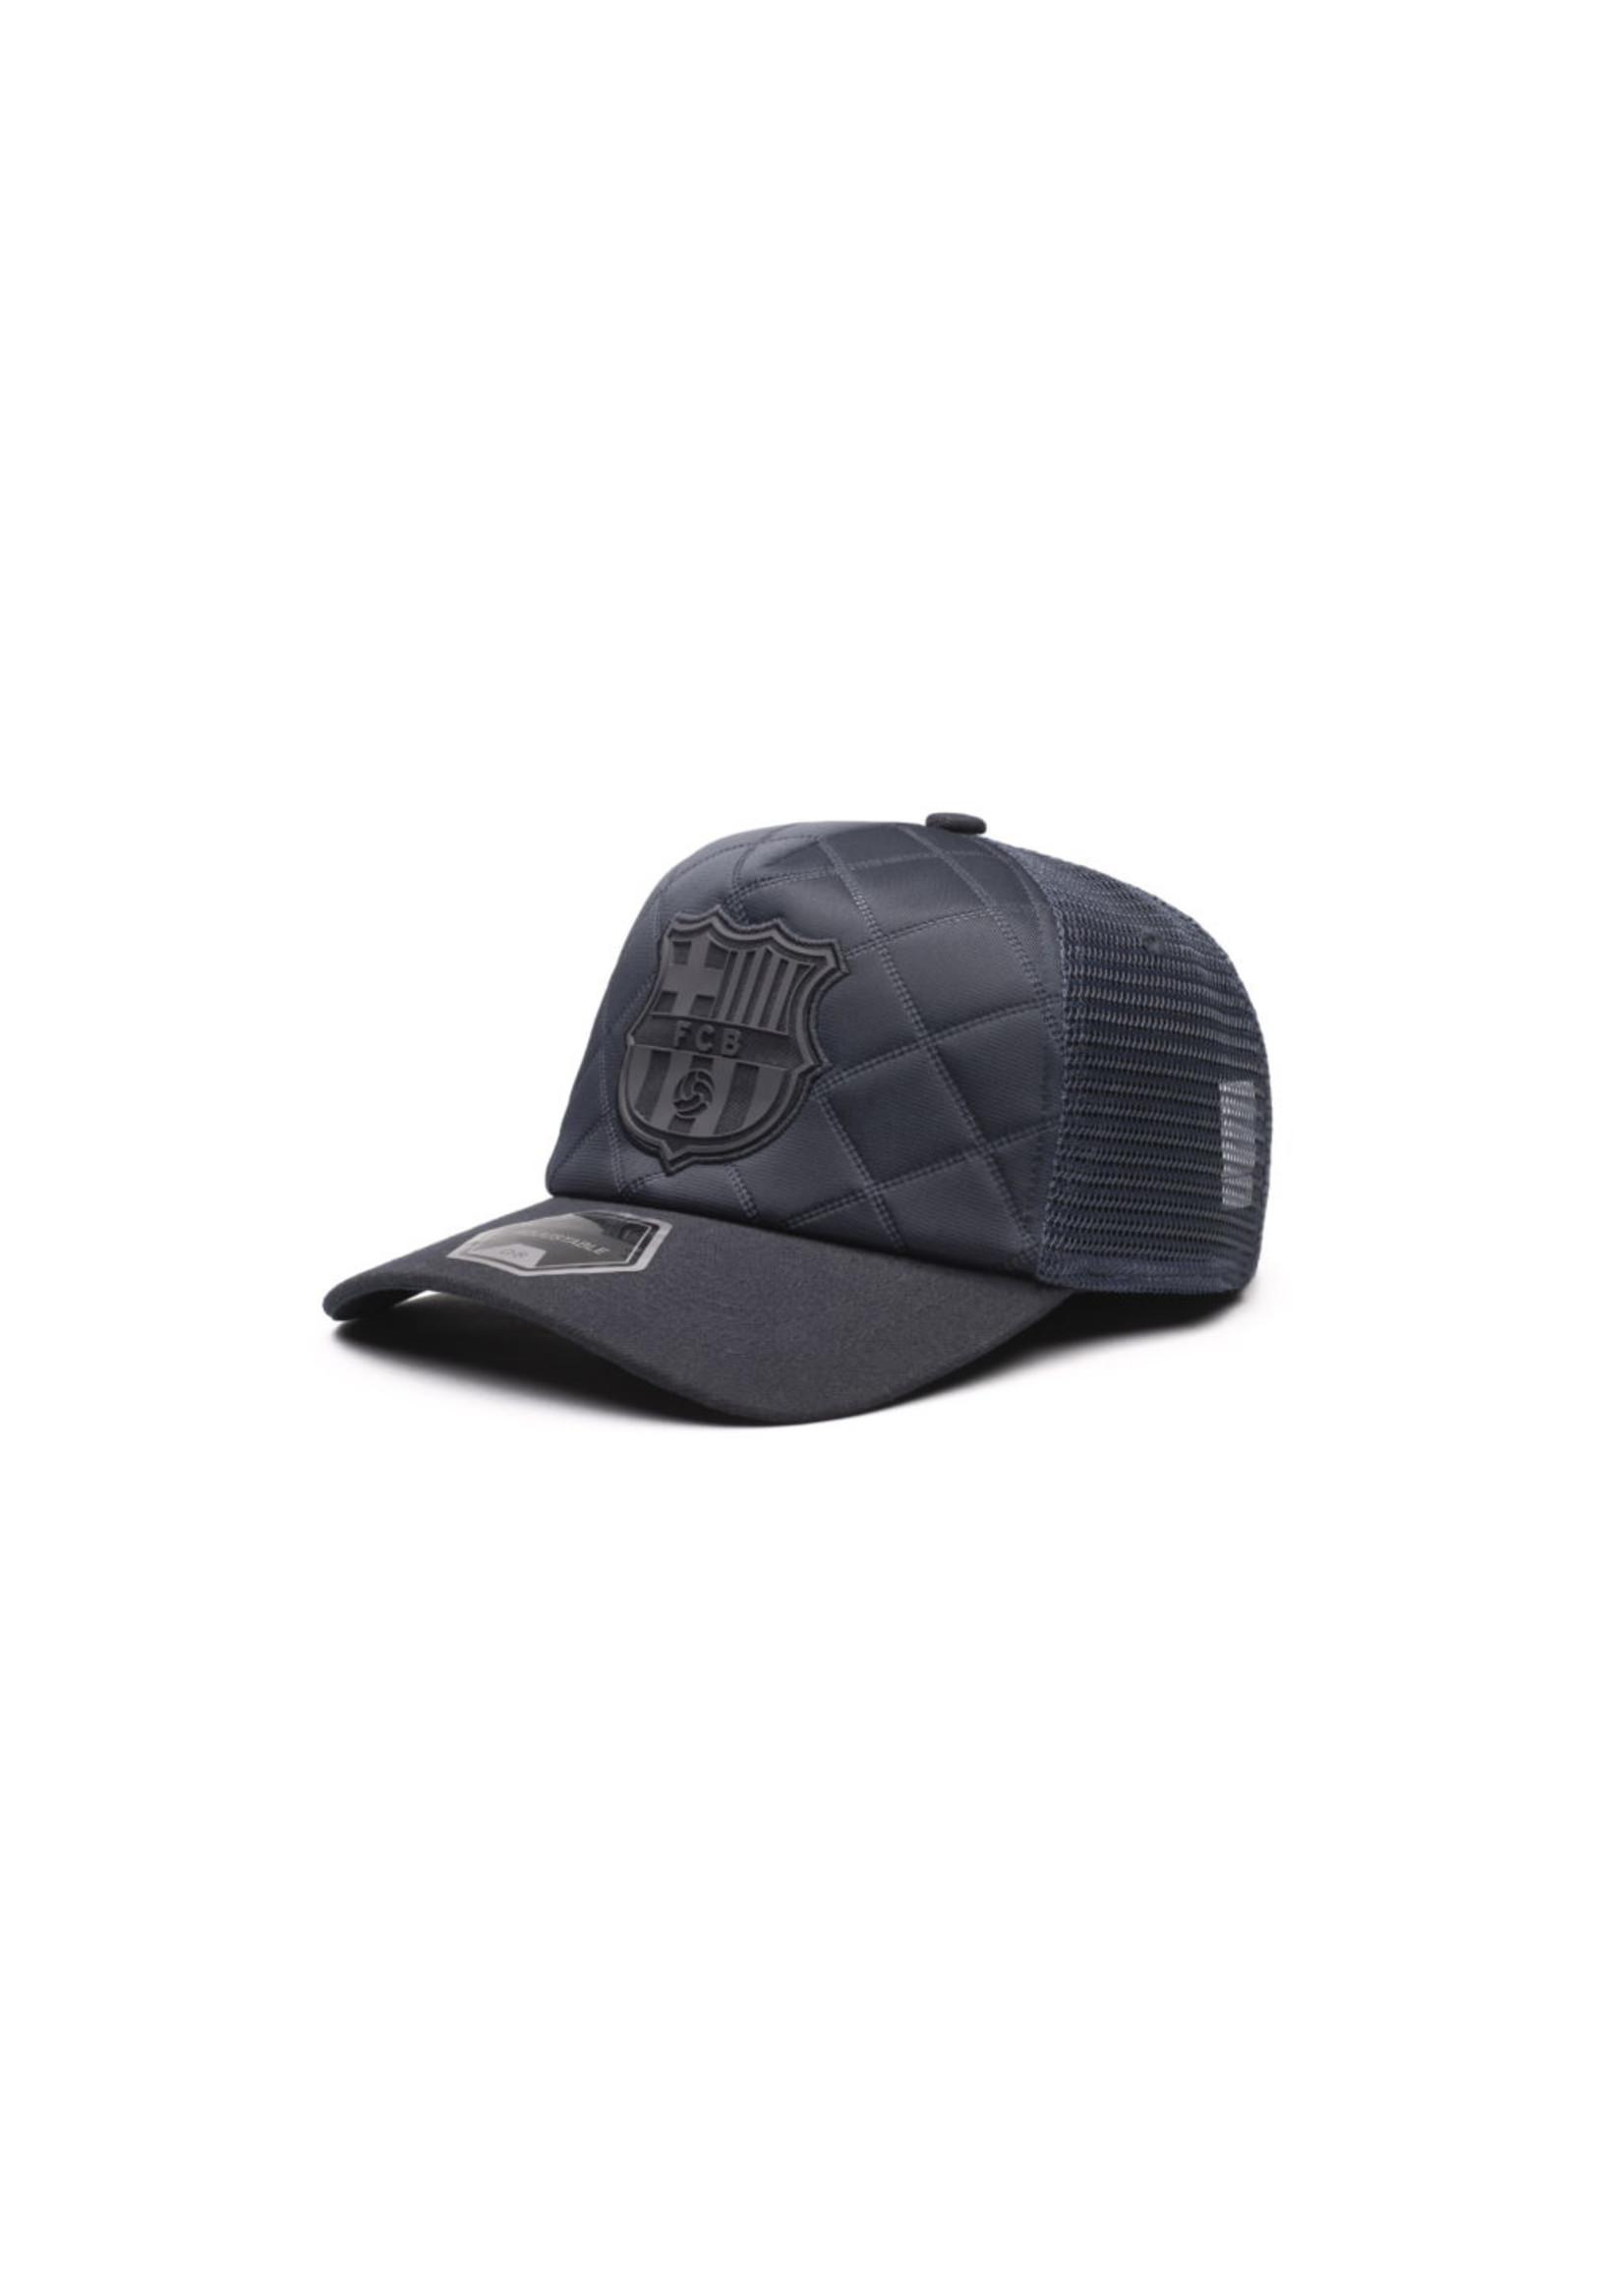 Barcelona Premium Onyx Trucker Hat